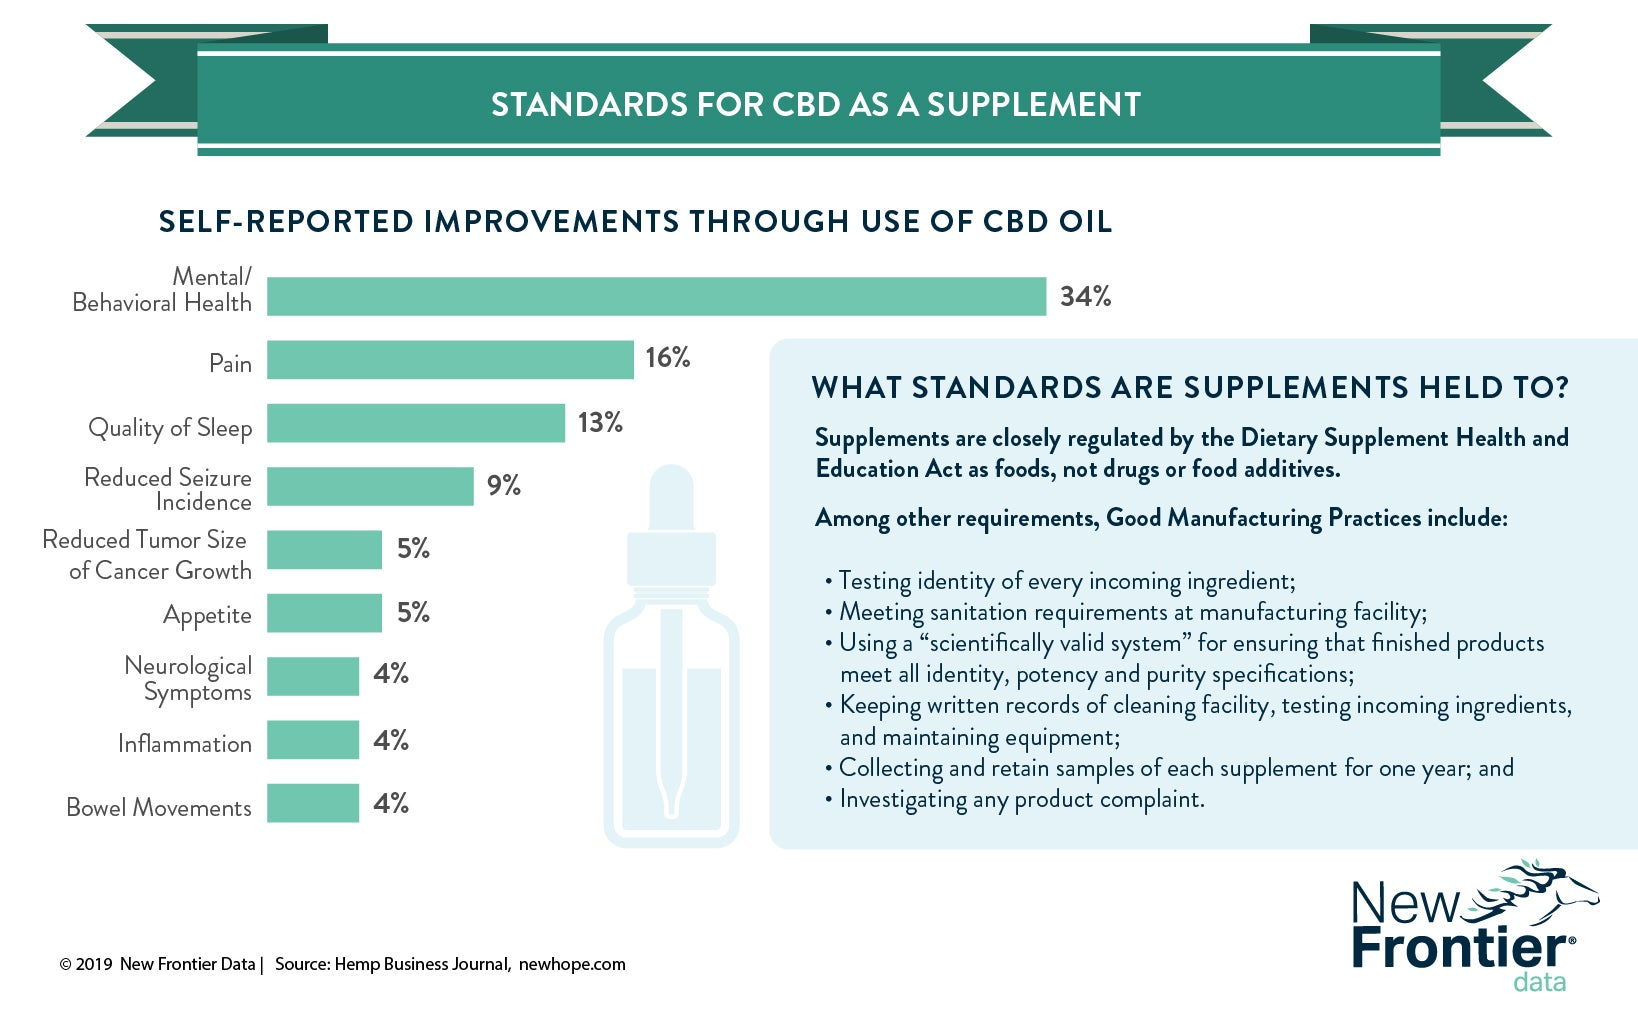 5-15-19-cbd-supplements-1.jpg